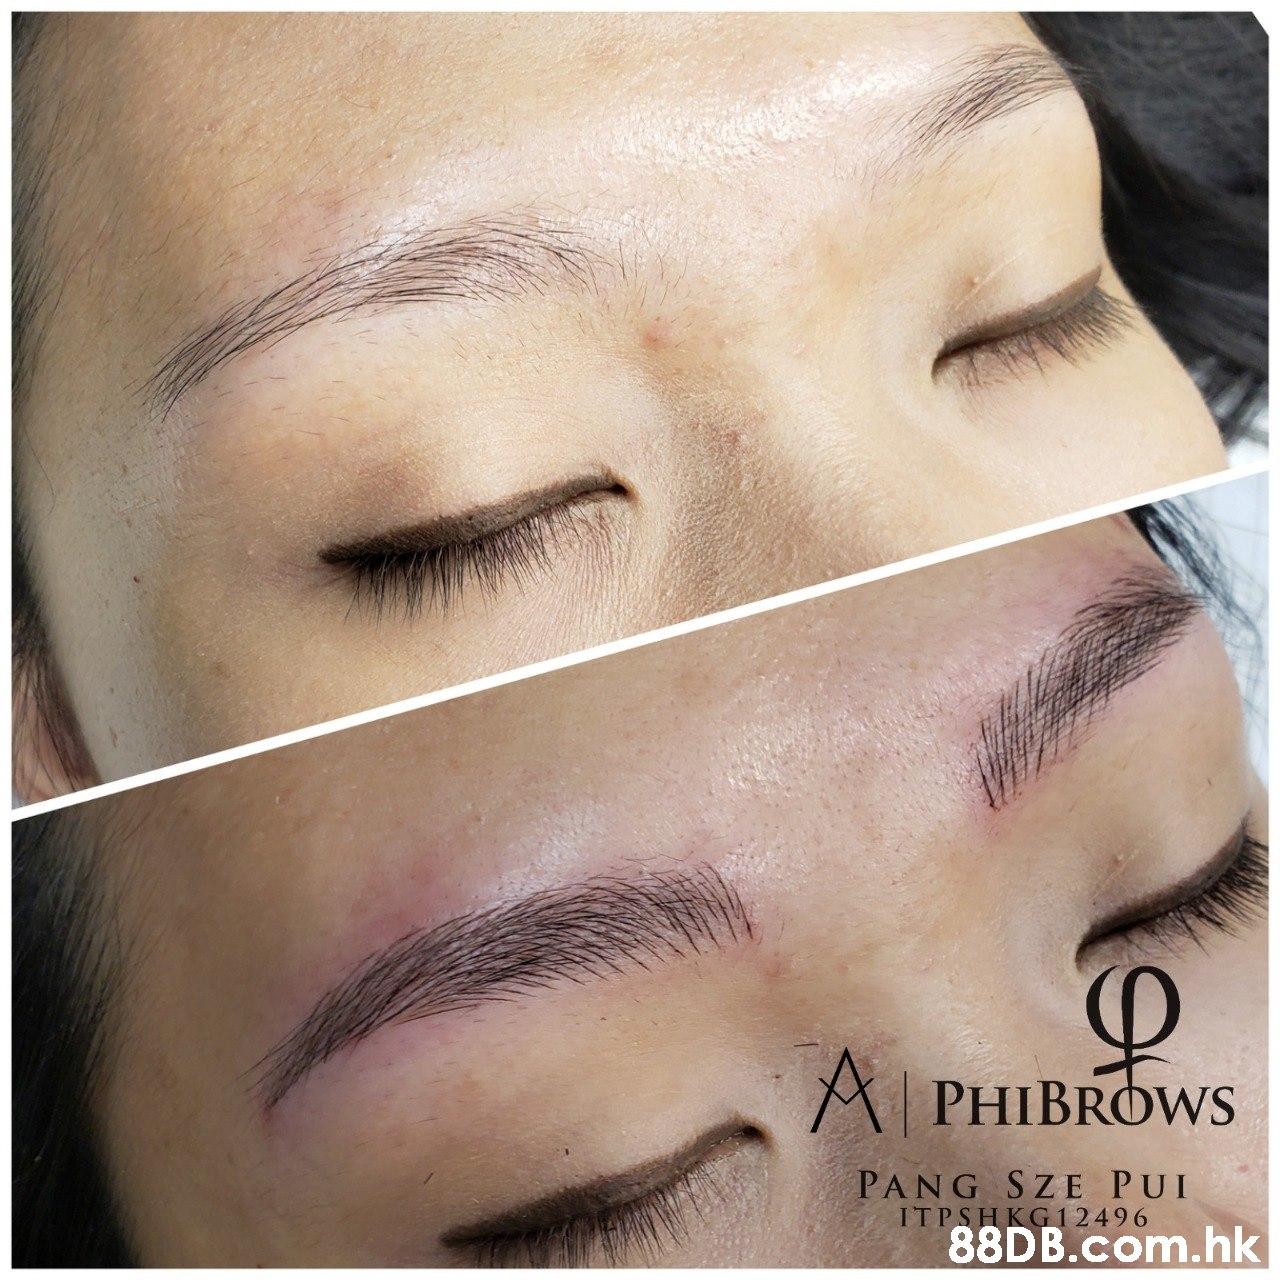 APHIBROWS PANG SZE PUI ITPSHKG 1 2 496 88D B.Com.hk  Eyebrow,Face,Skin,Eyelash,Eye